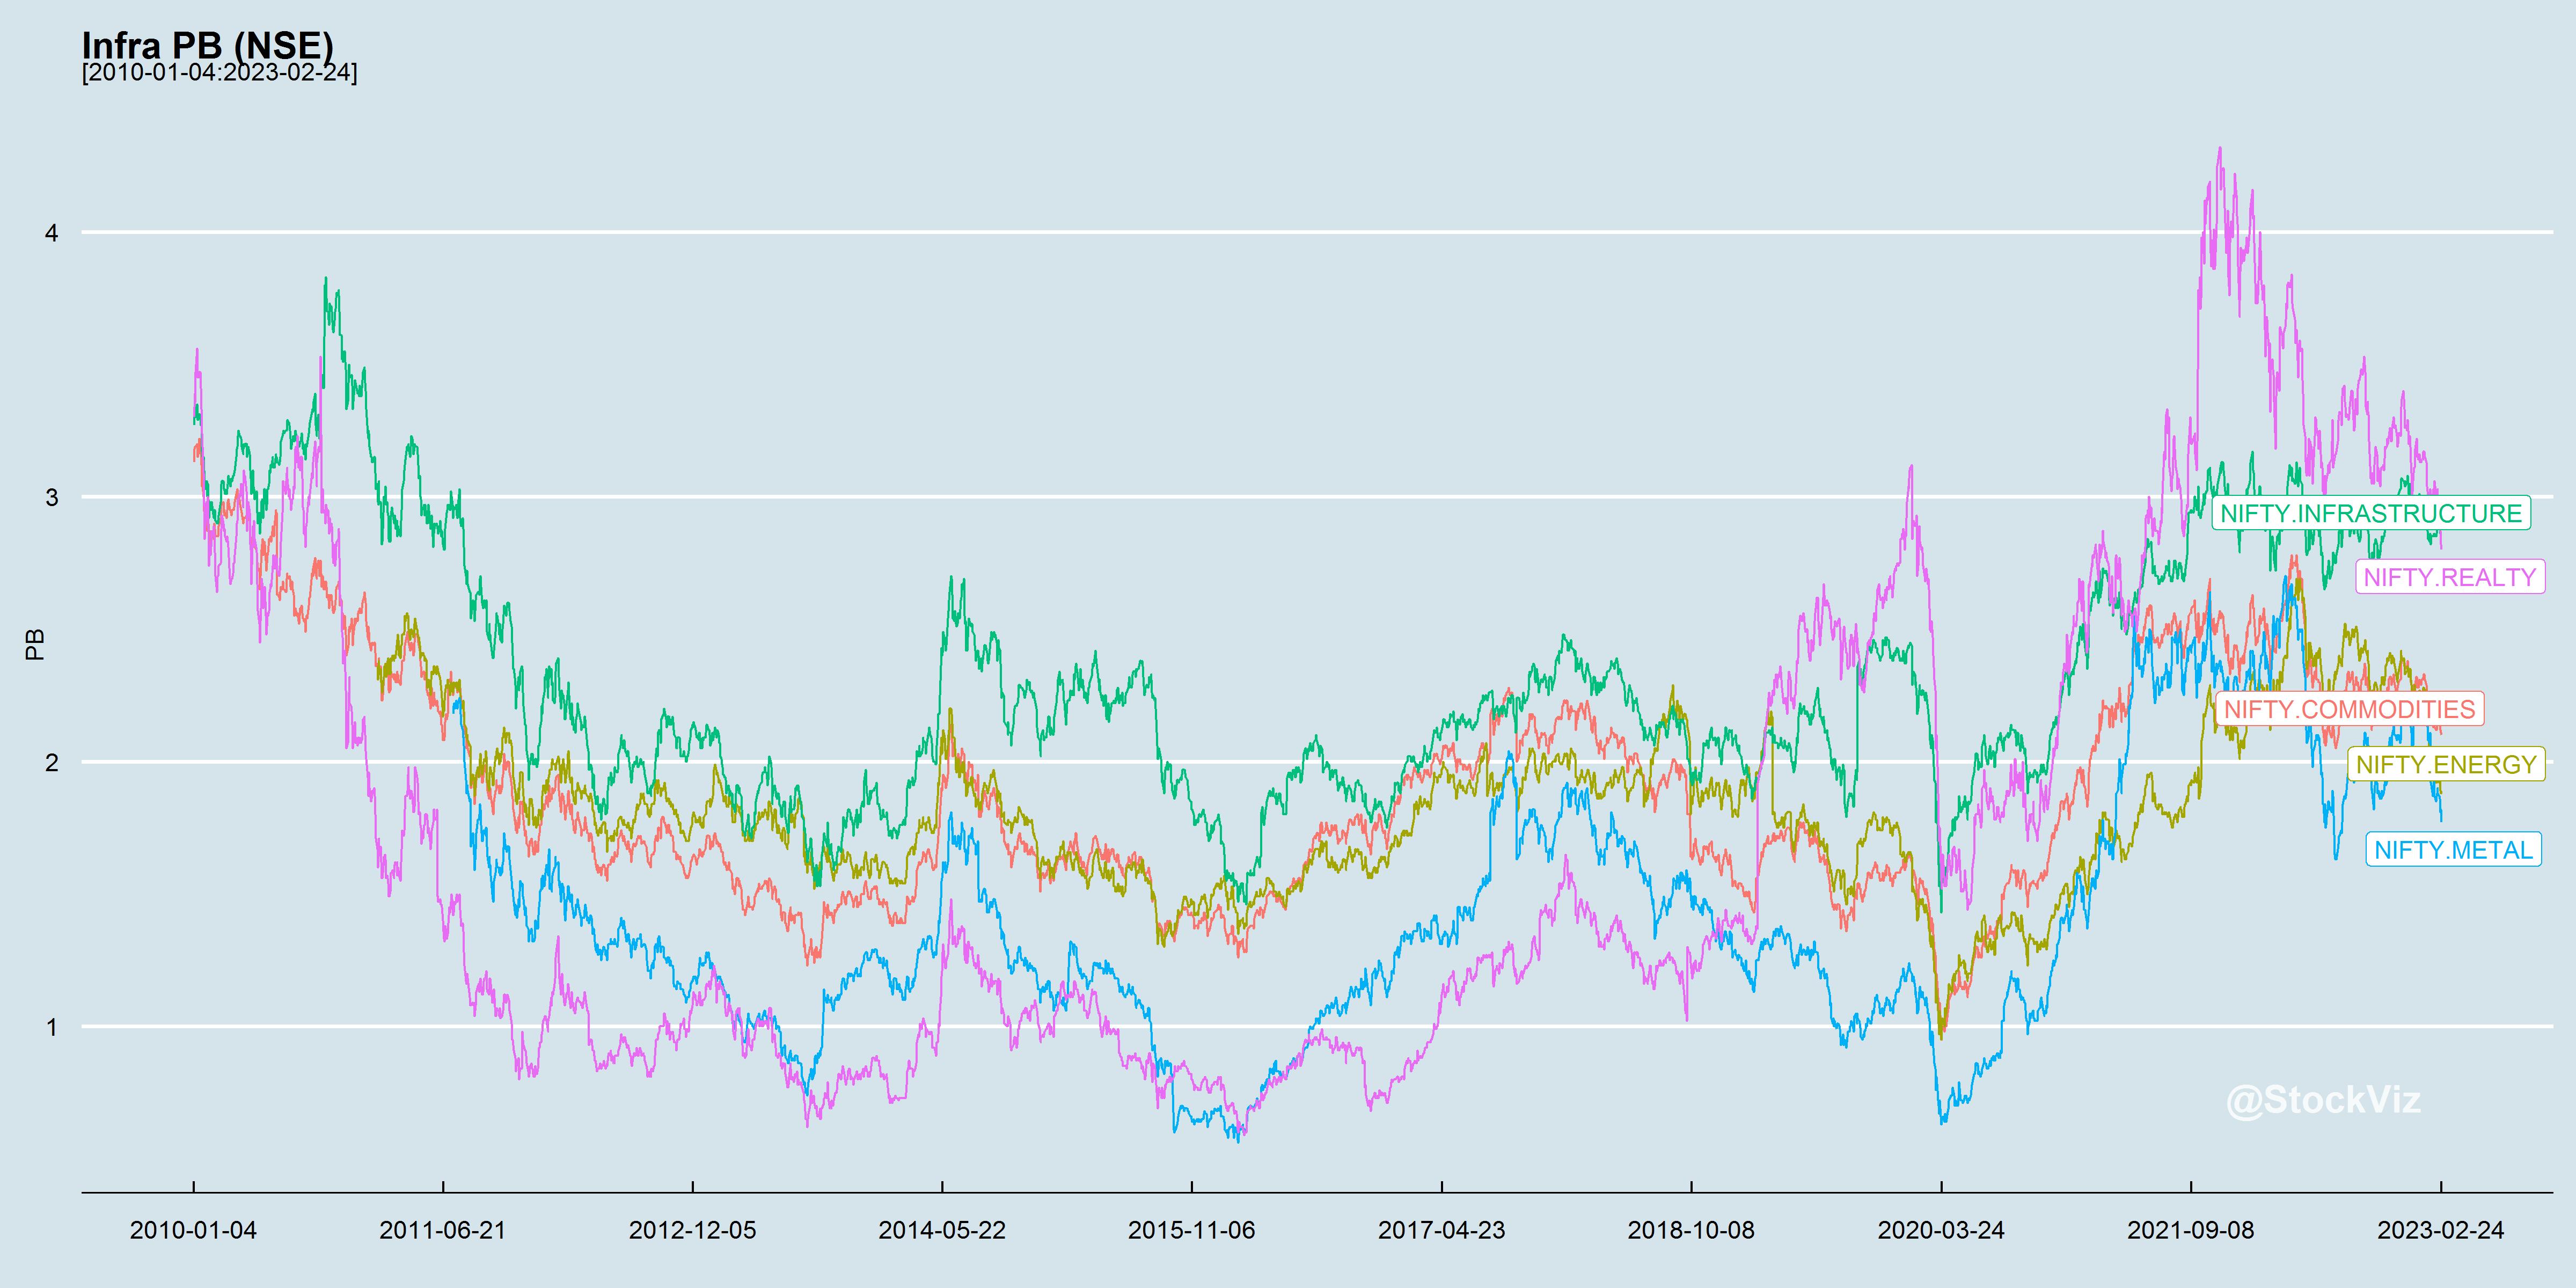 Infra PB chart